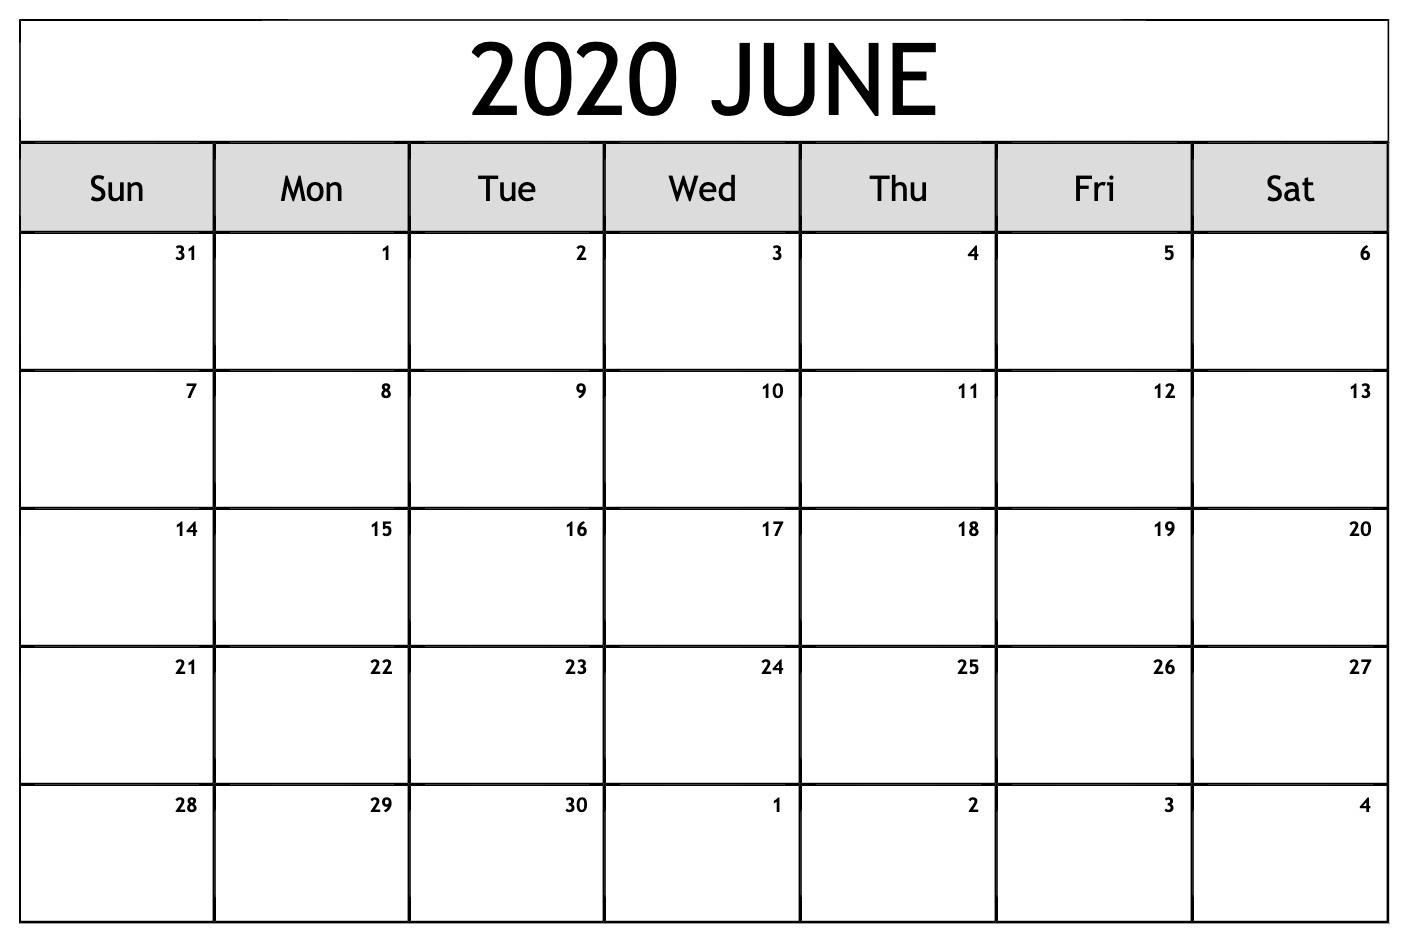 June 2020 Monthly Calendar Free